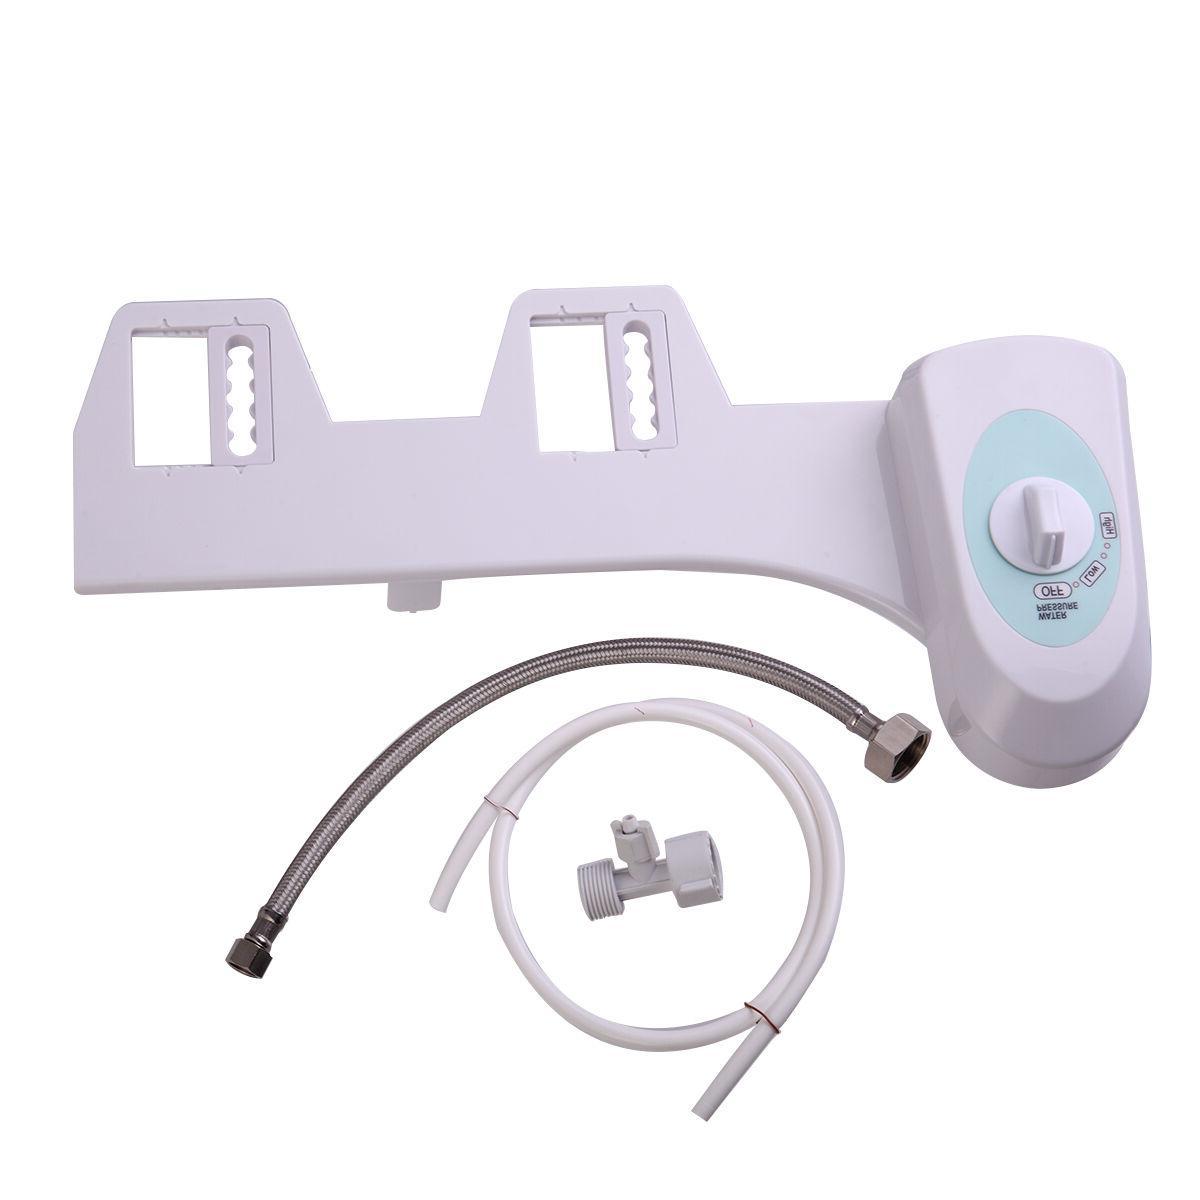 Adjustable Non-Electric Mechanical Bidet Flash Toilet Attachment